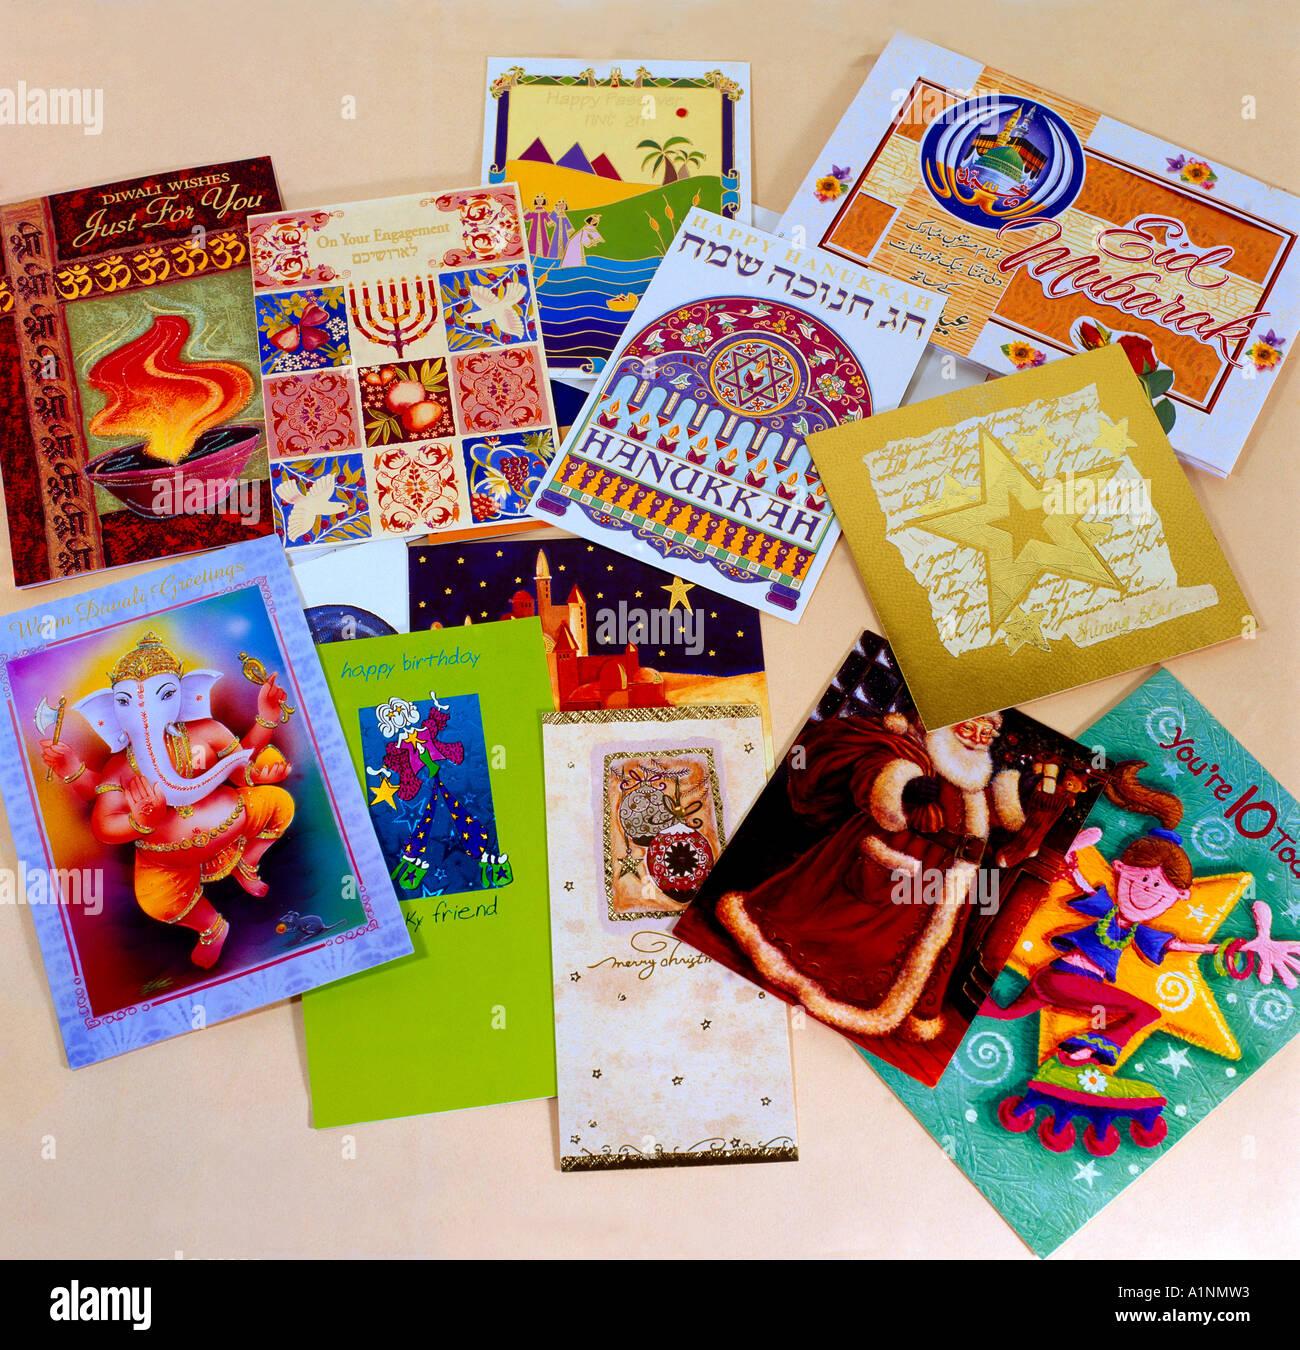 Greetings & Celebration Cards - Stock Image